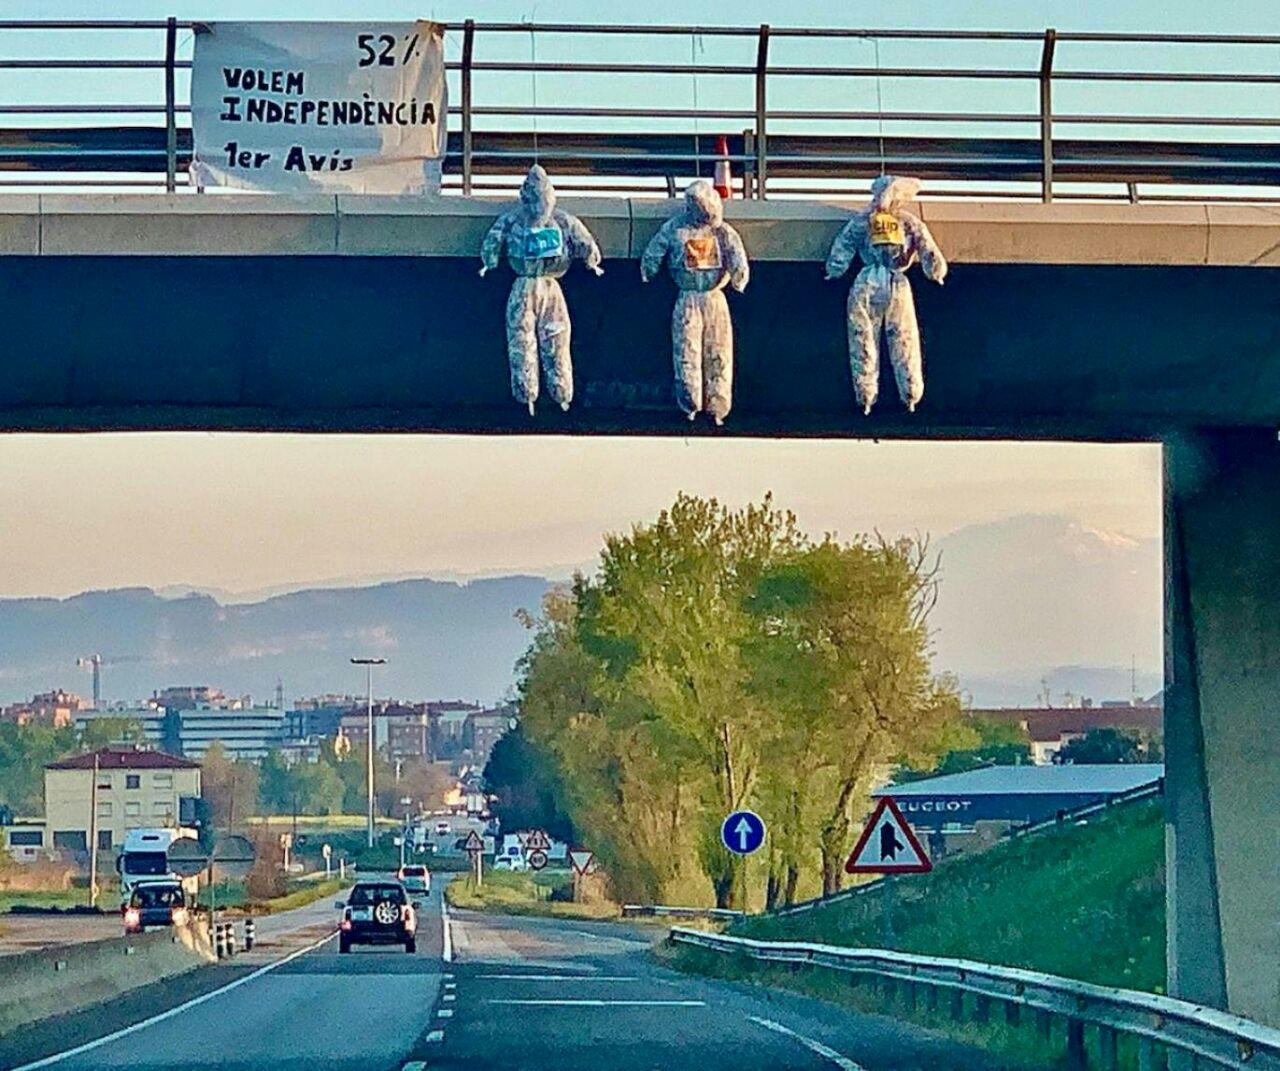 Ninots penjats a ponts/ACN